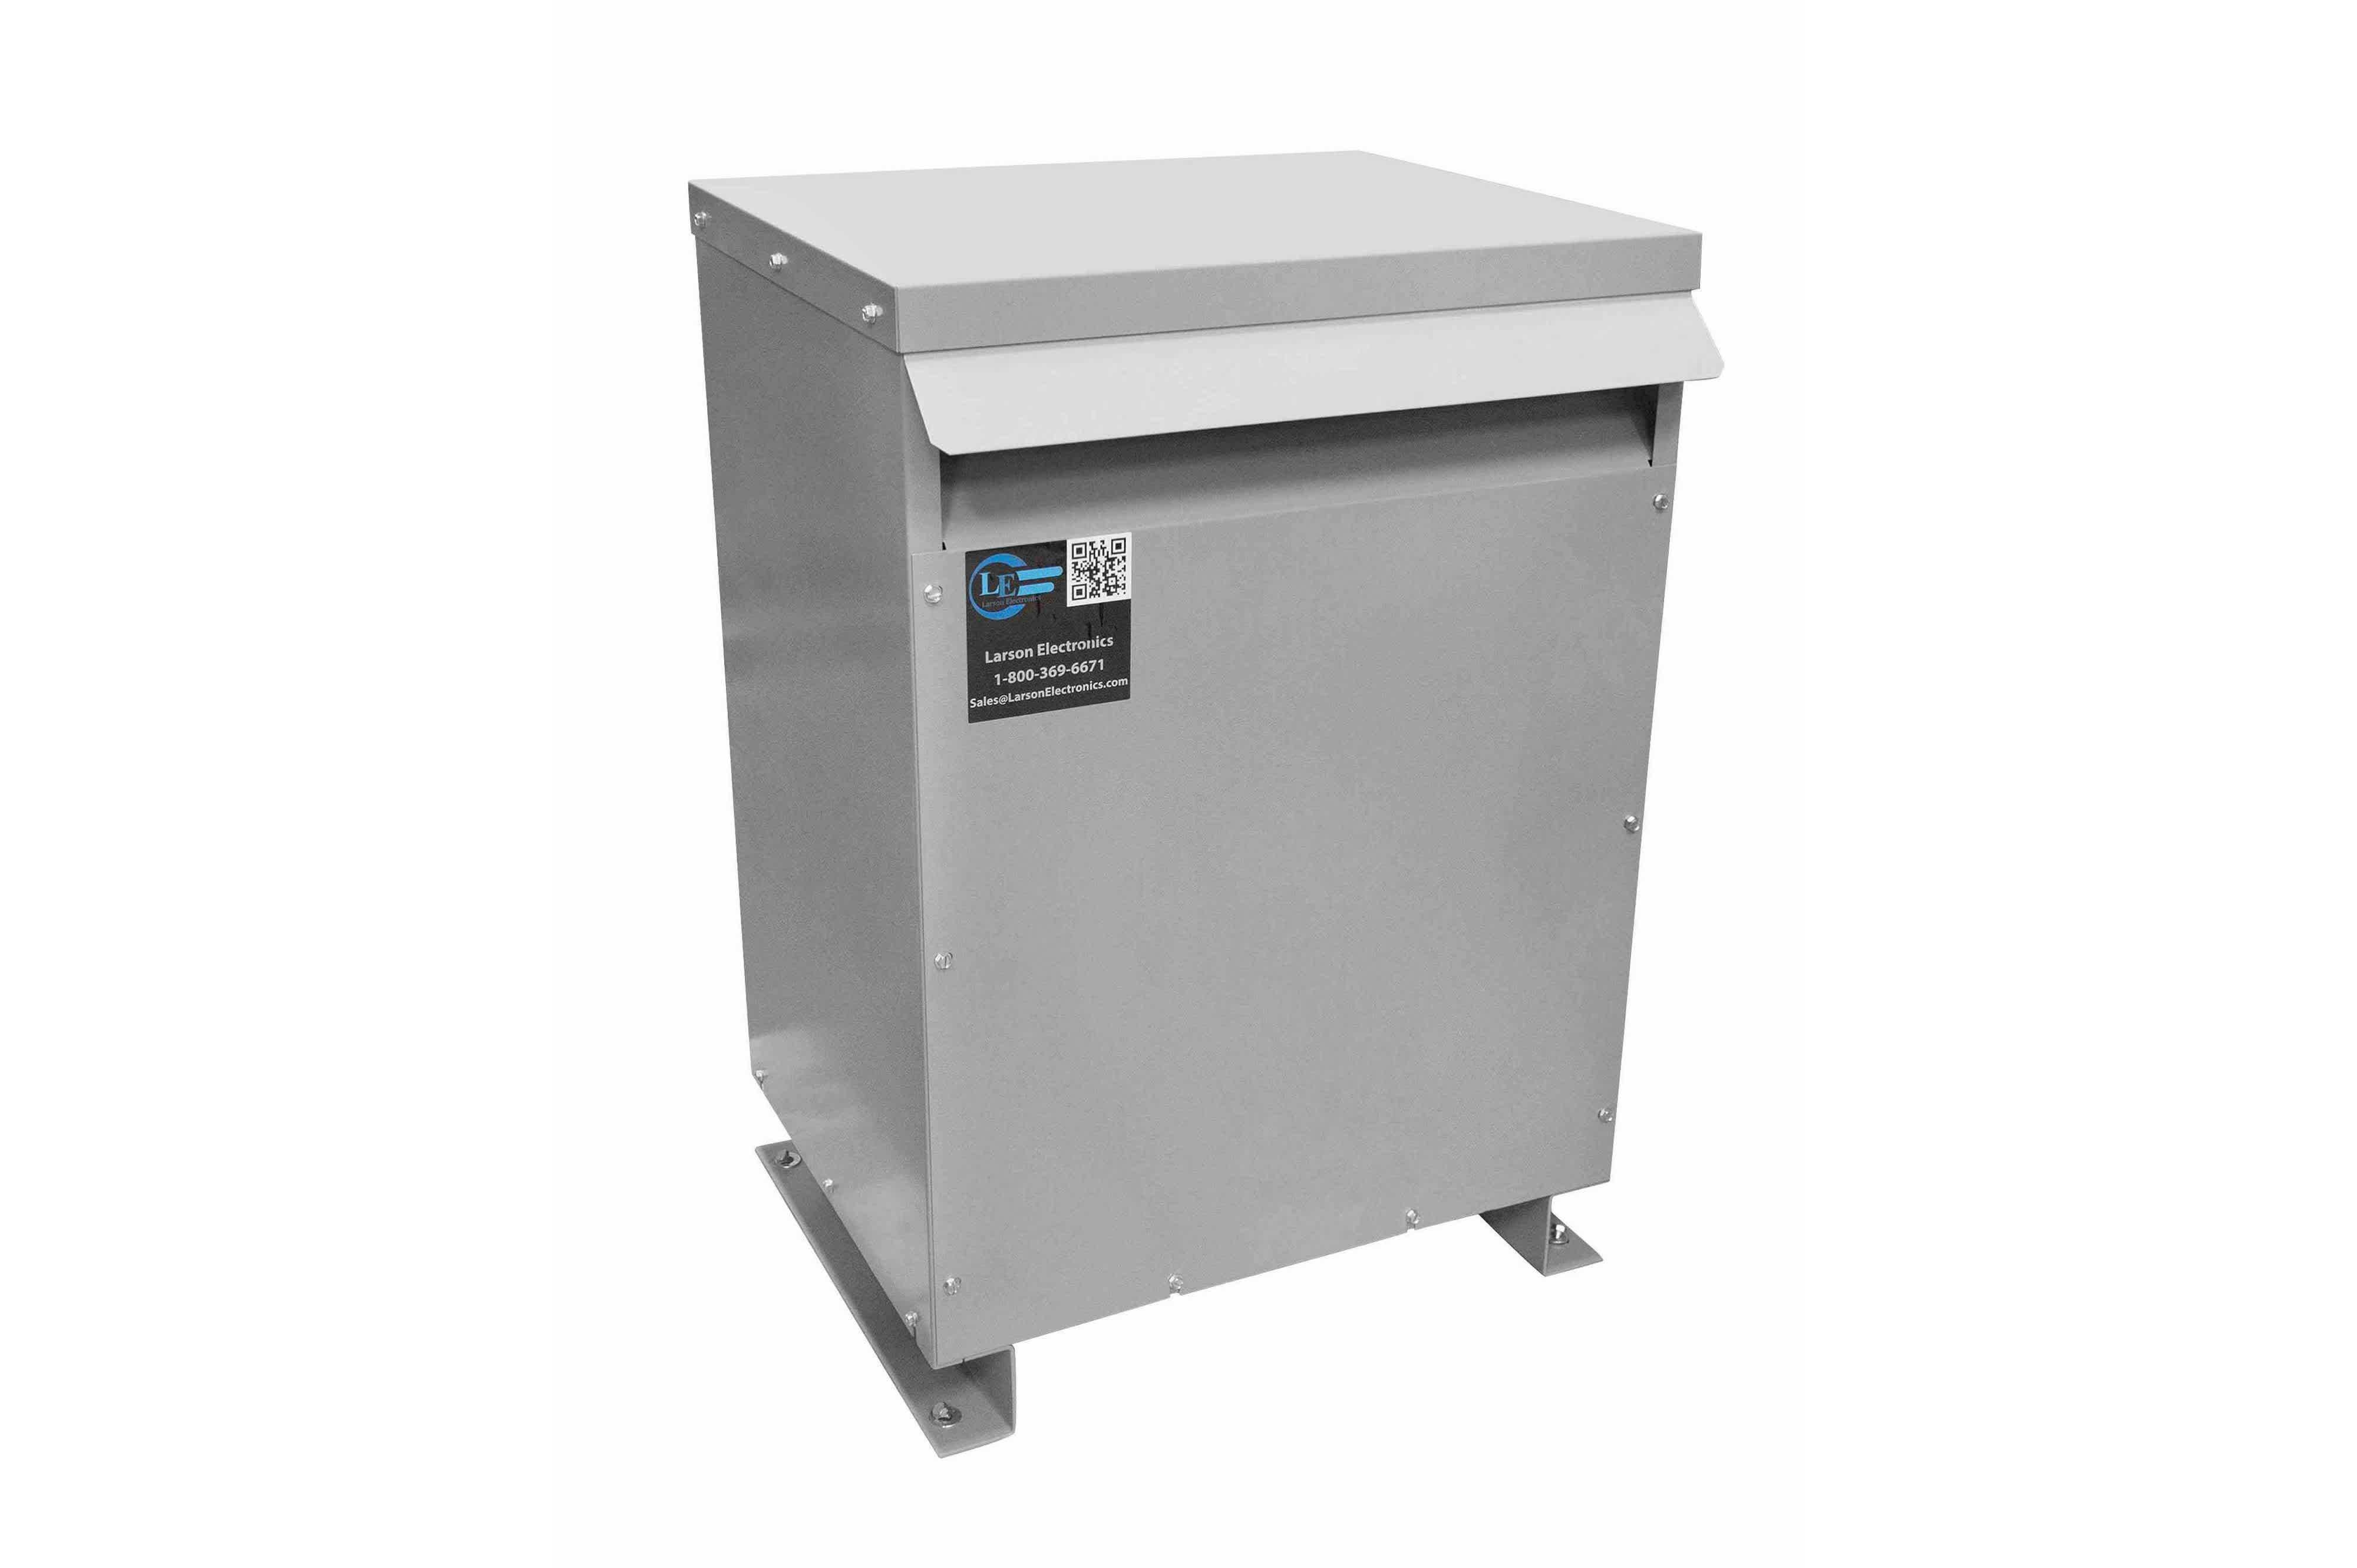 26 kVA 3PH Isolation Transformer, 240V Wye Primary, 480Y/277 Wye-N Secondary, N3R, Ventilated, 60 Hz